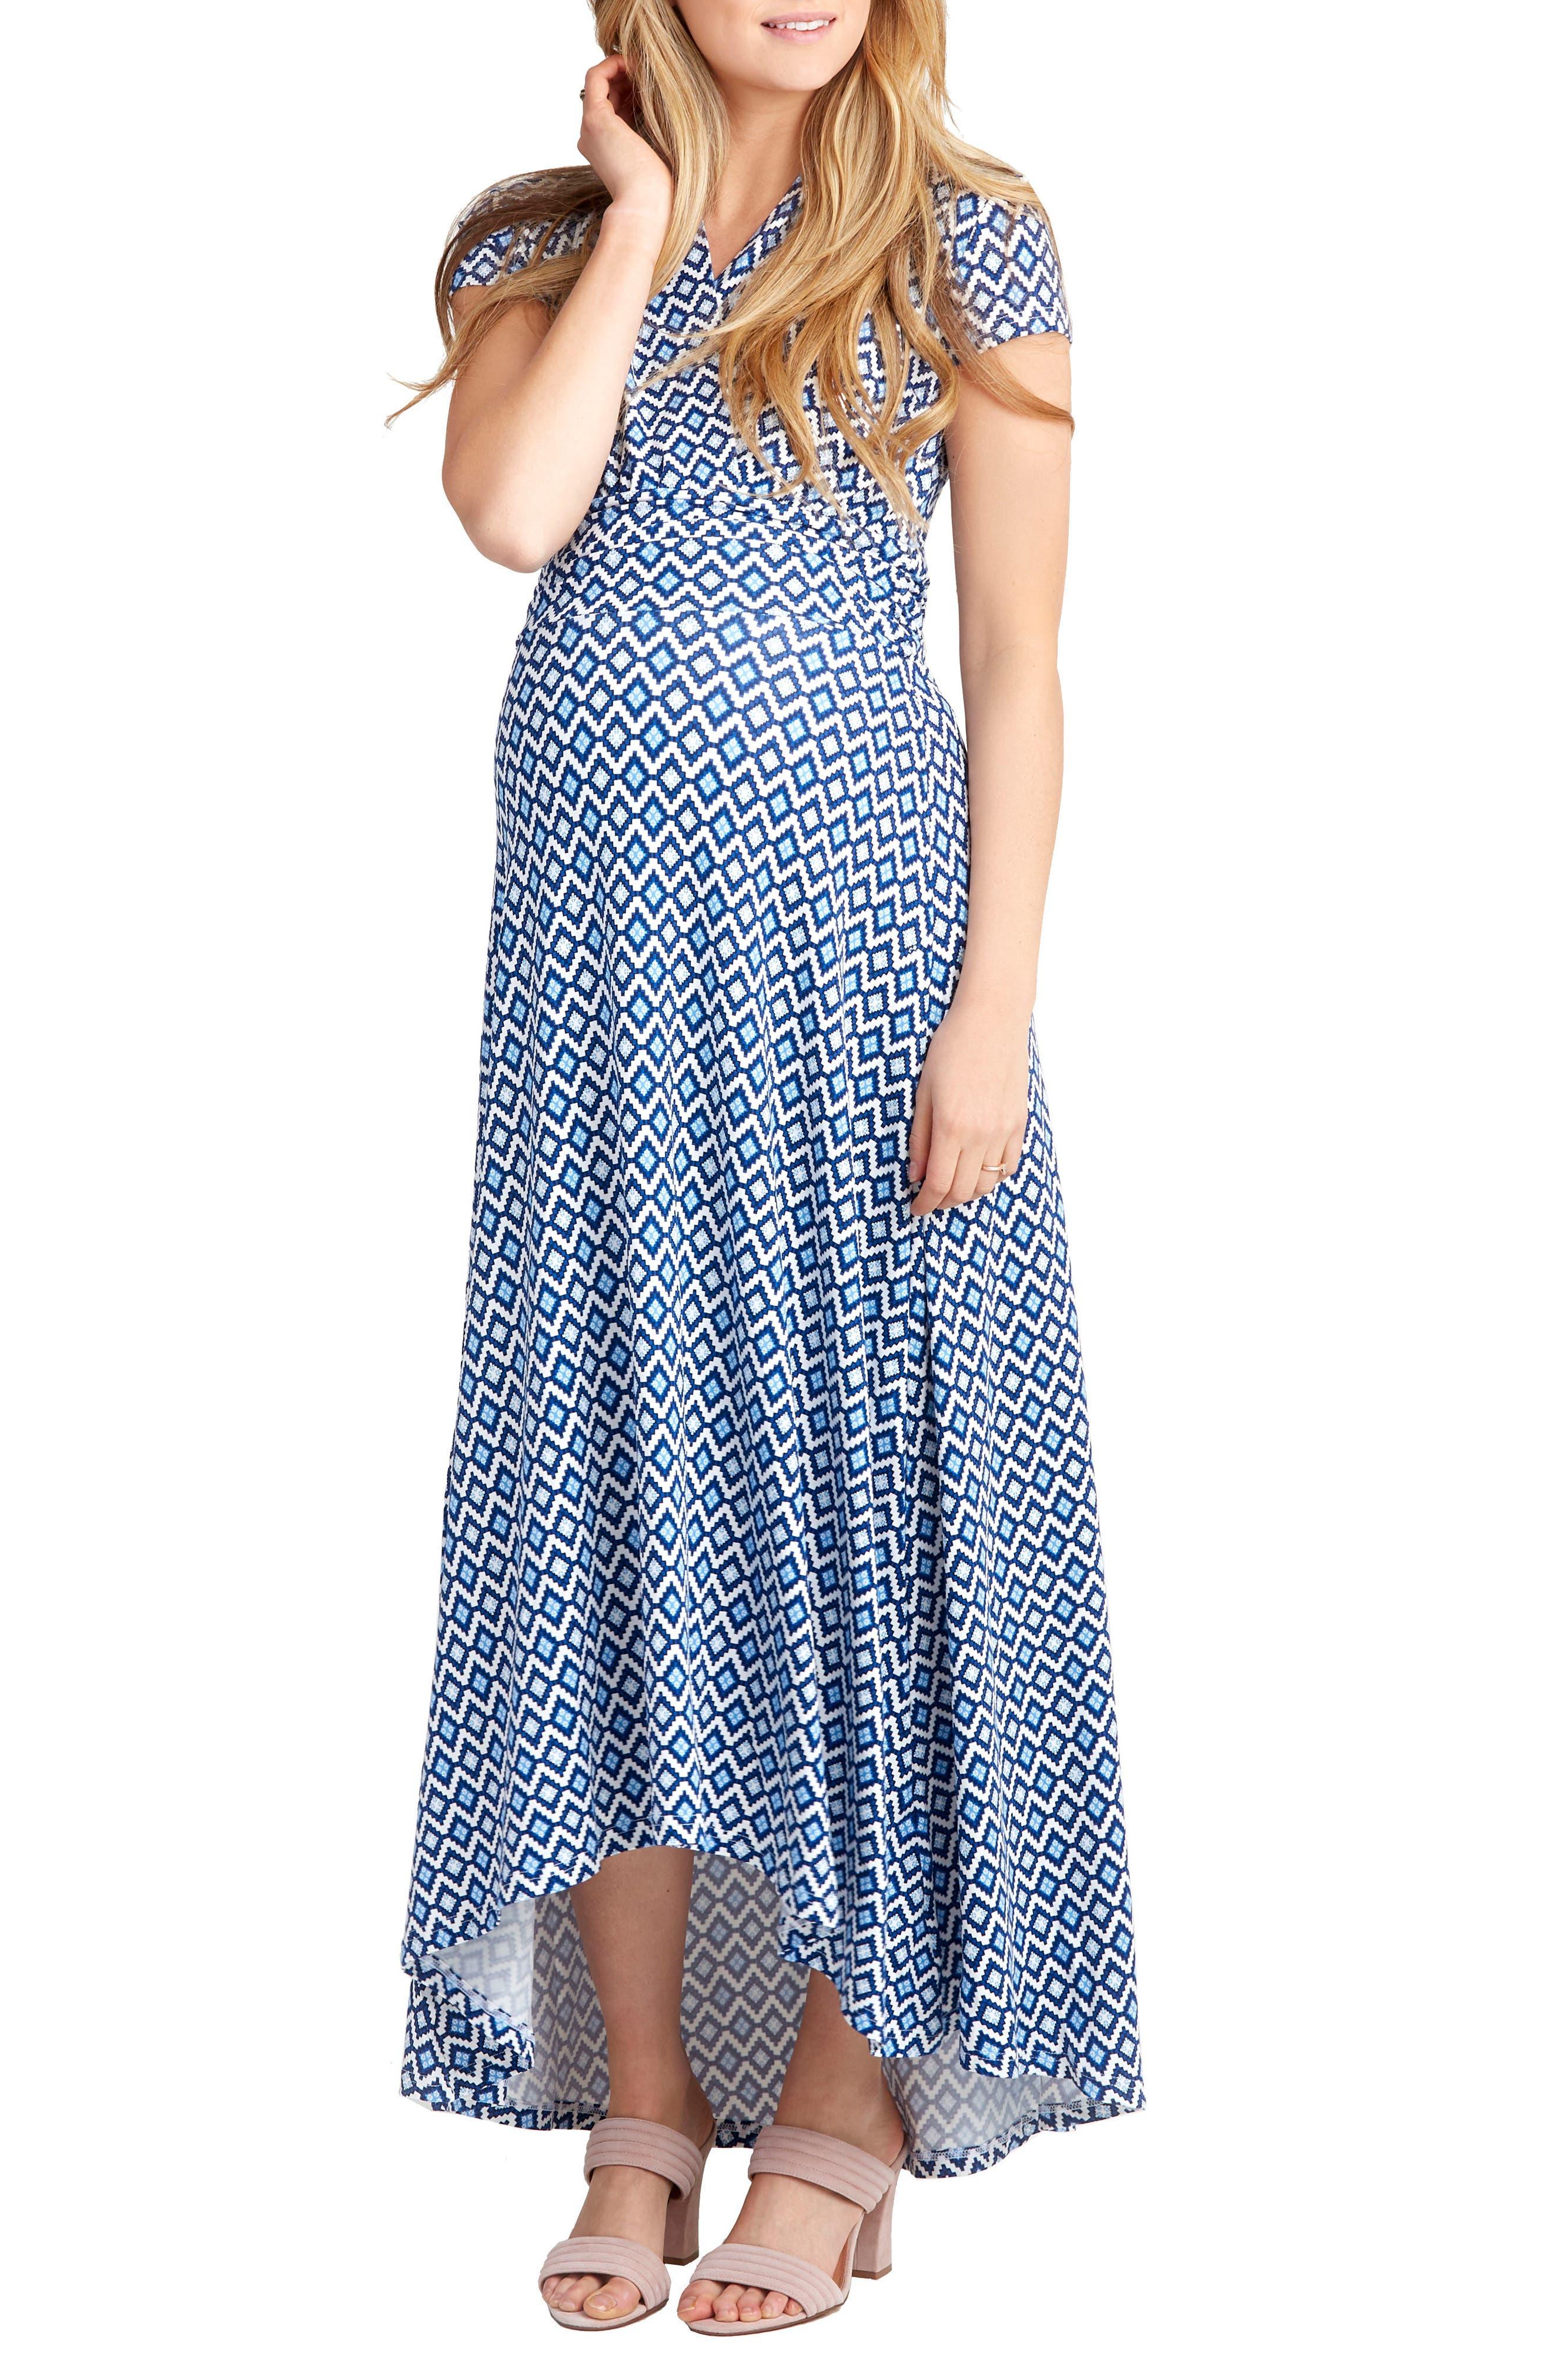 Alternate Image 1 Selected - Nom Maternity 'Caroline' Maternity/Nursing Maxi Dress